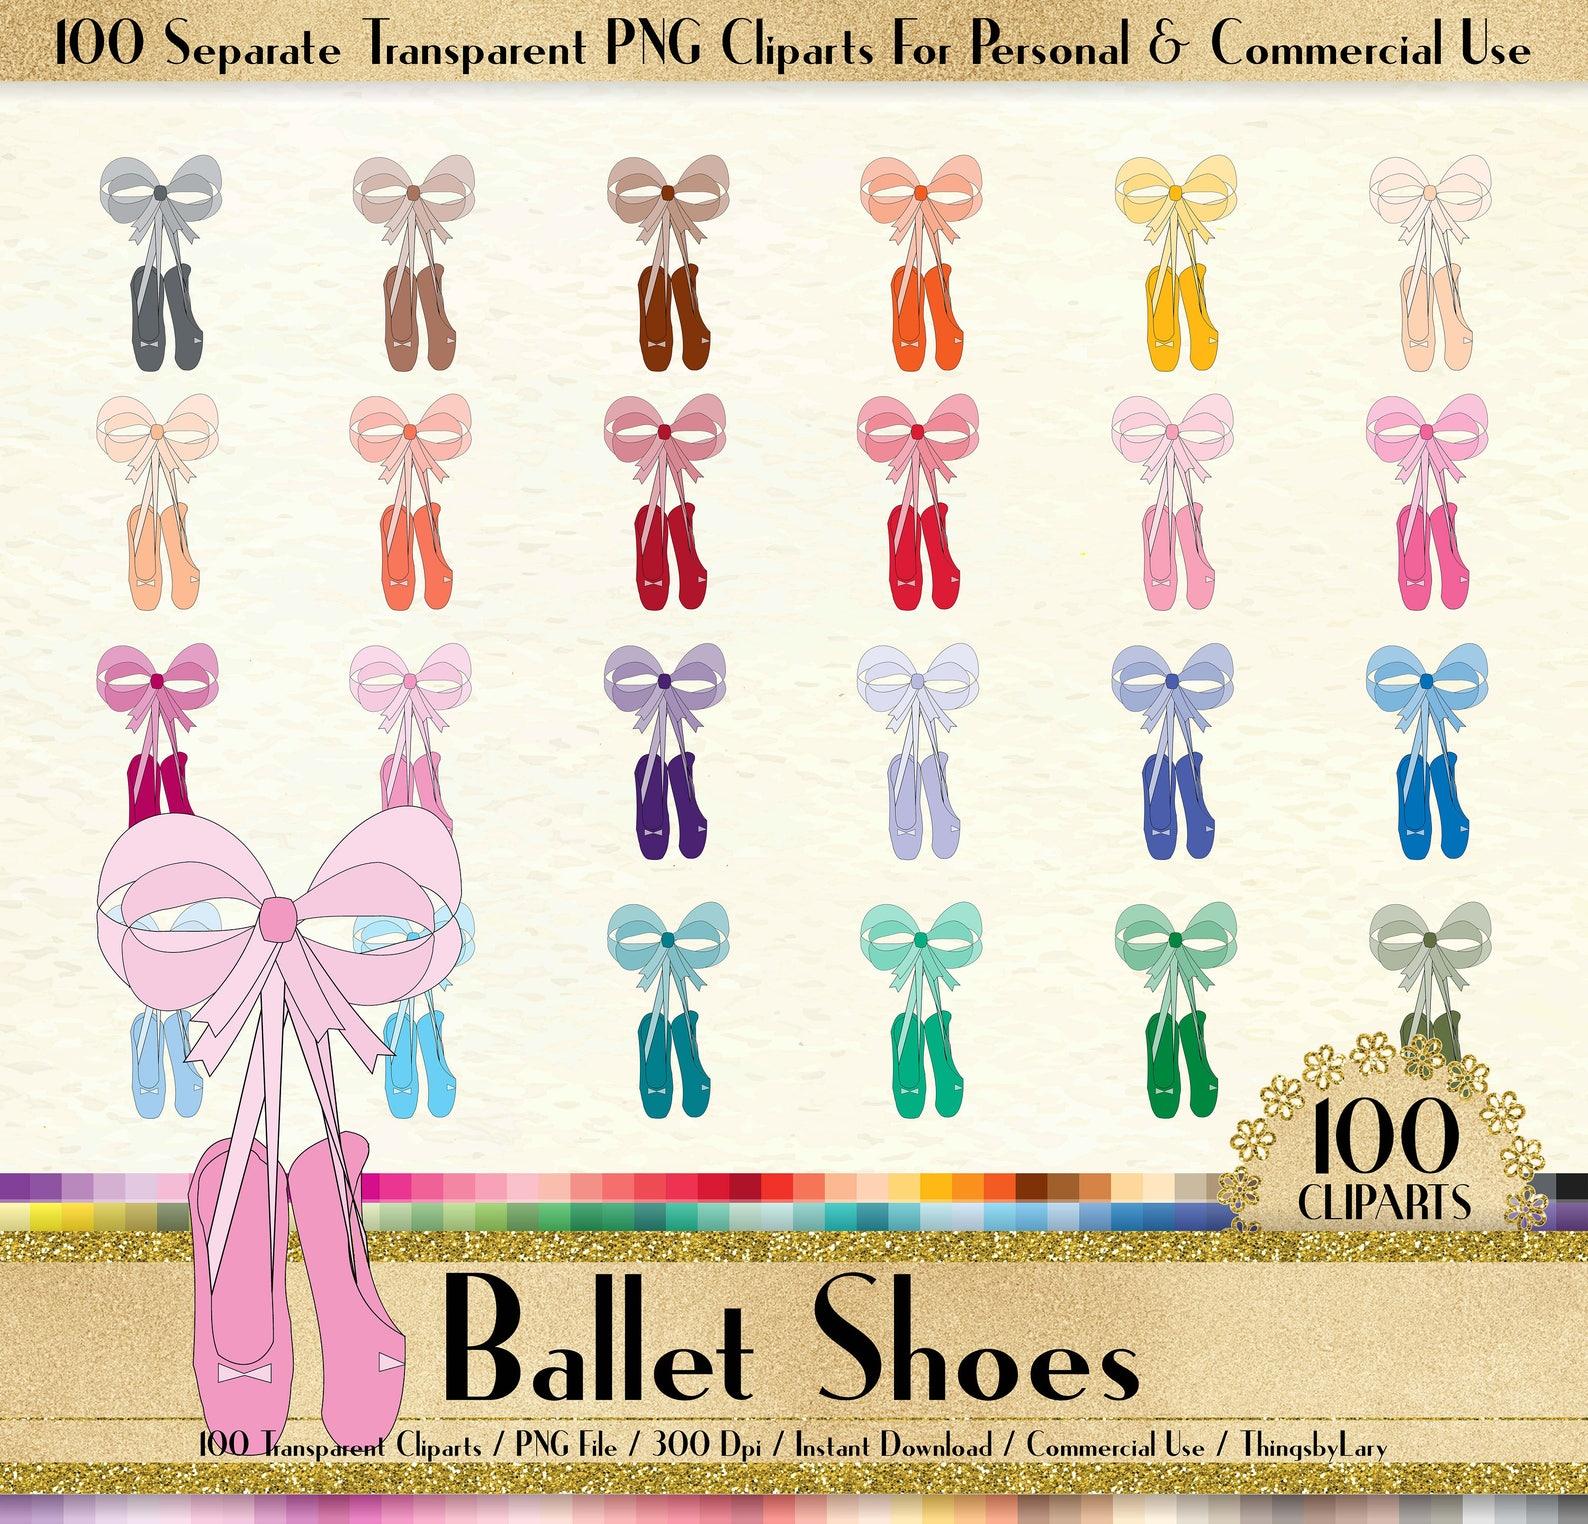 100 ballet shoes clipart,princess shoes,100 png clip art,planner clipart,instant download clipart,kid girl clipart, fashion clip